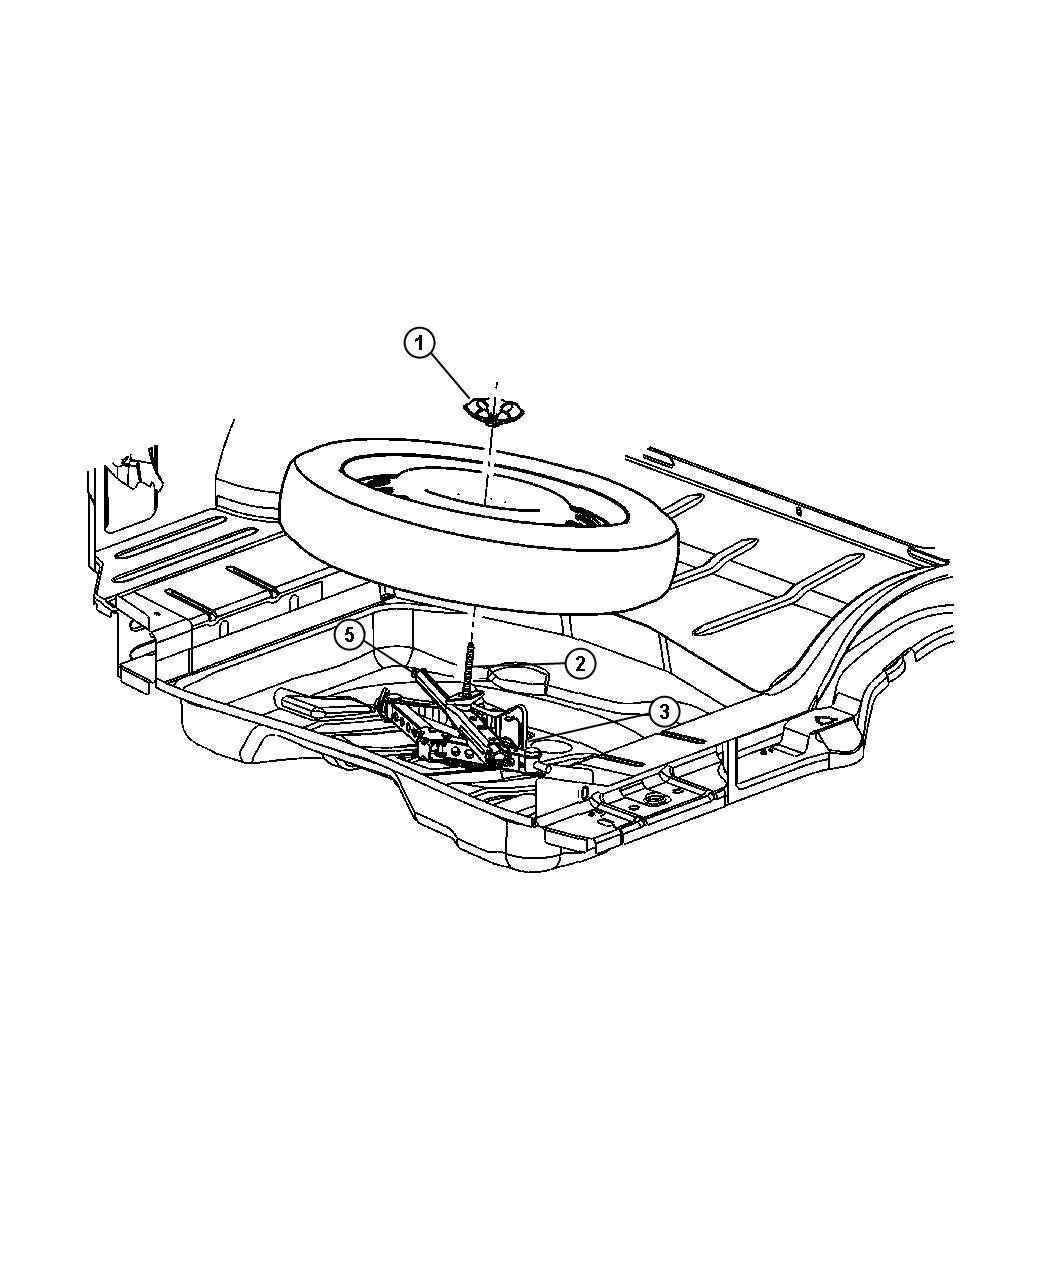 diagram further jeep wrangler radiator parts diagram on manual